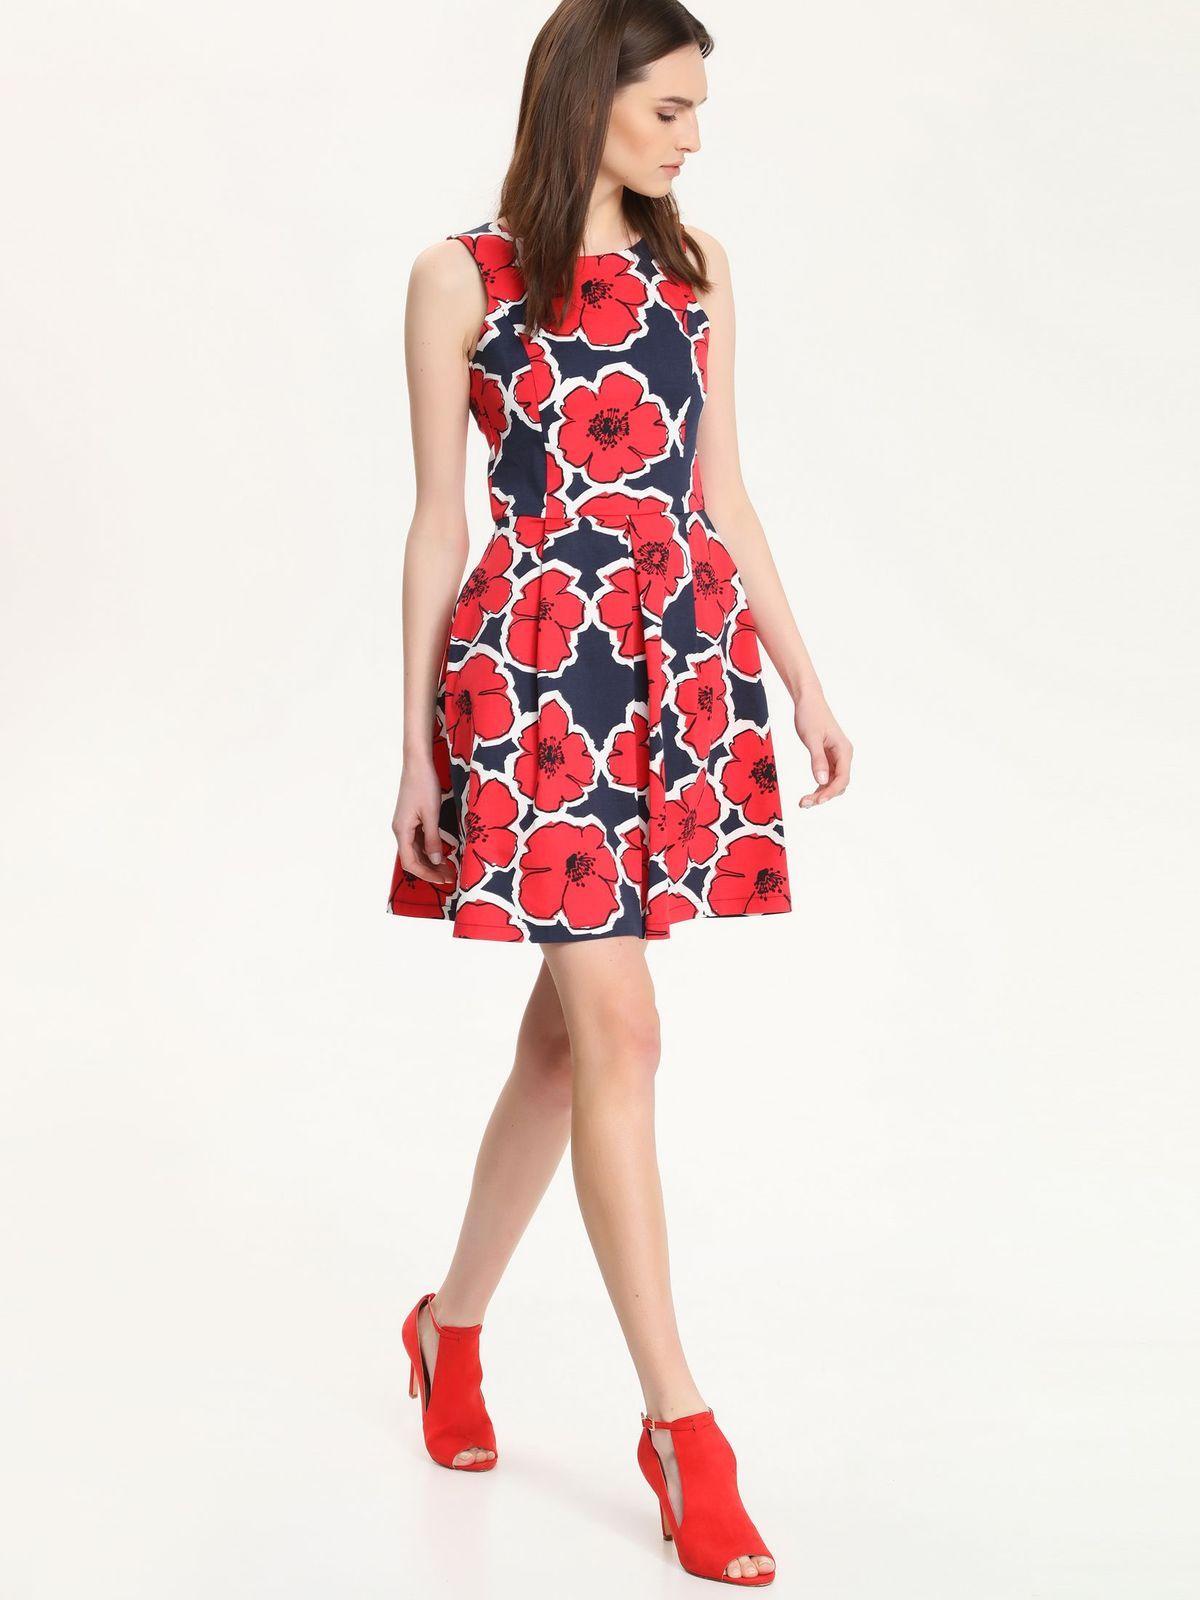 TOP SECRET φλοραλ κλος φορεμα